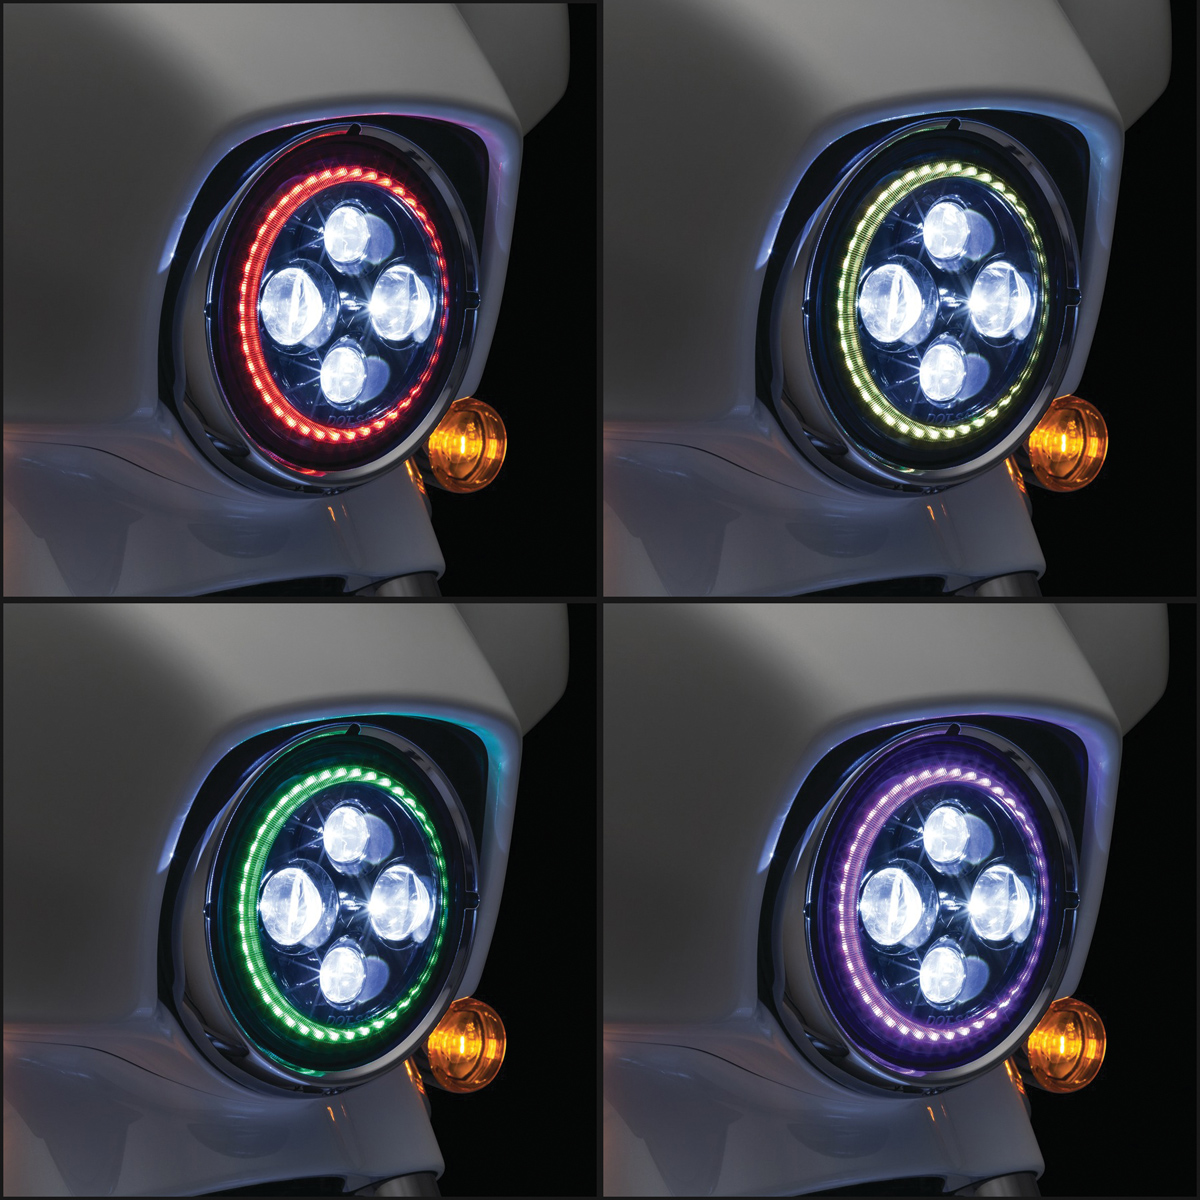 Kuryakyn 7 Led Orbit Prism Headlight 2461 Wiring Instructions